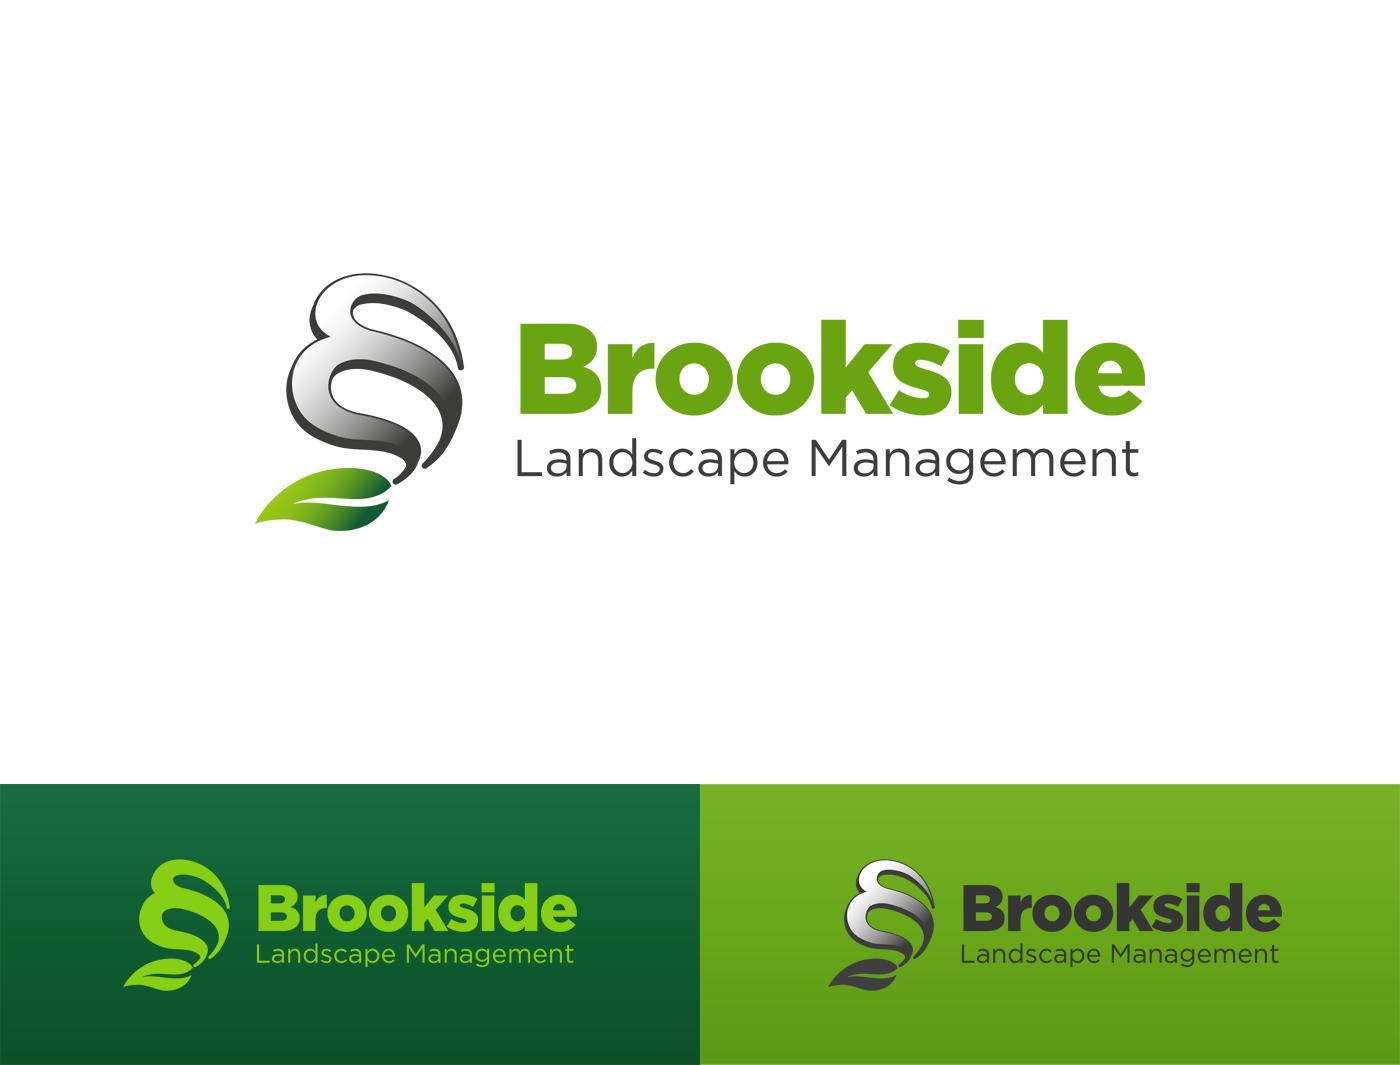 Logo Design by Alexander Osokin - Entry No. 26 in the Logo Design Contest New Logo Design for Brookside Landscape Management.